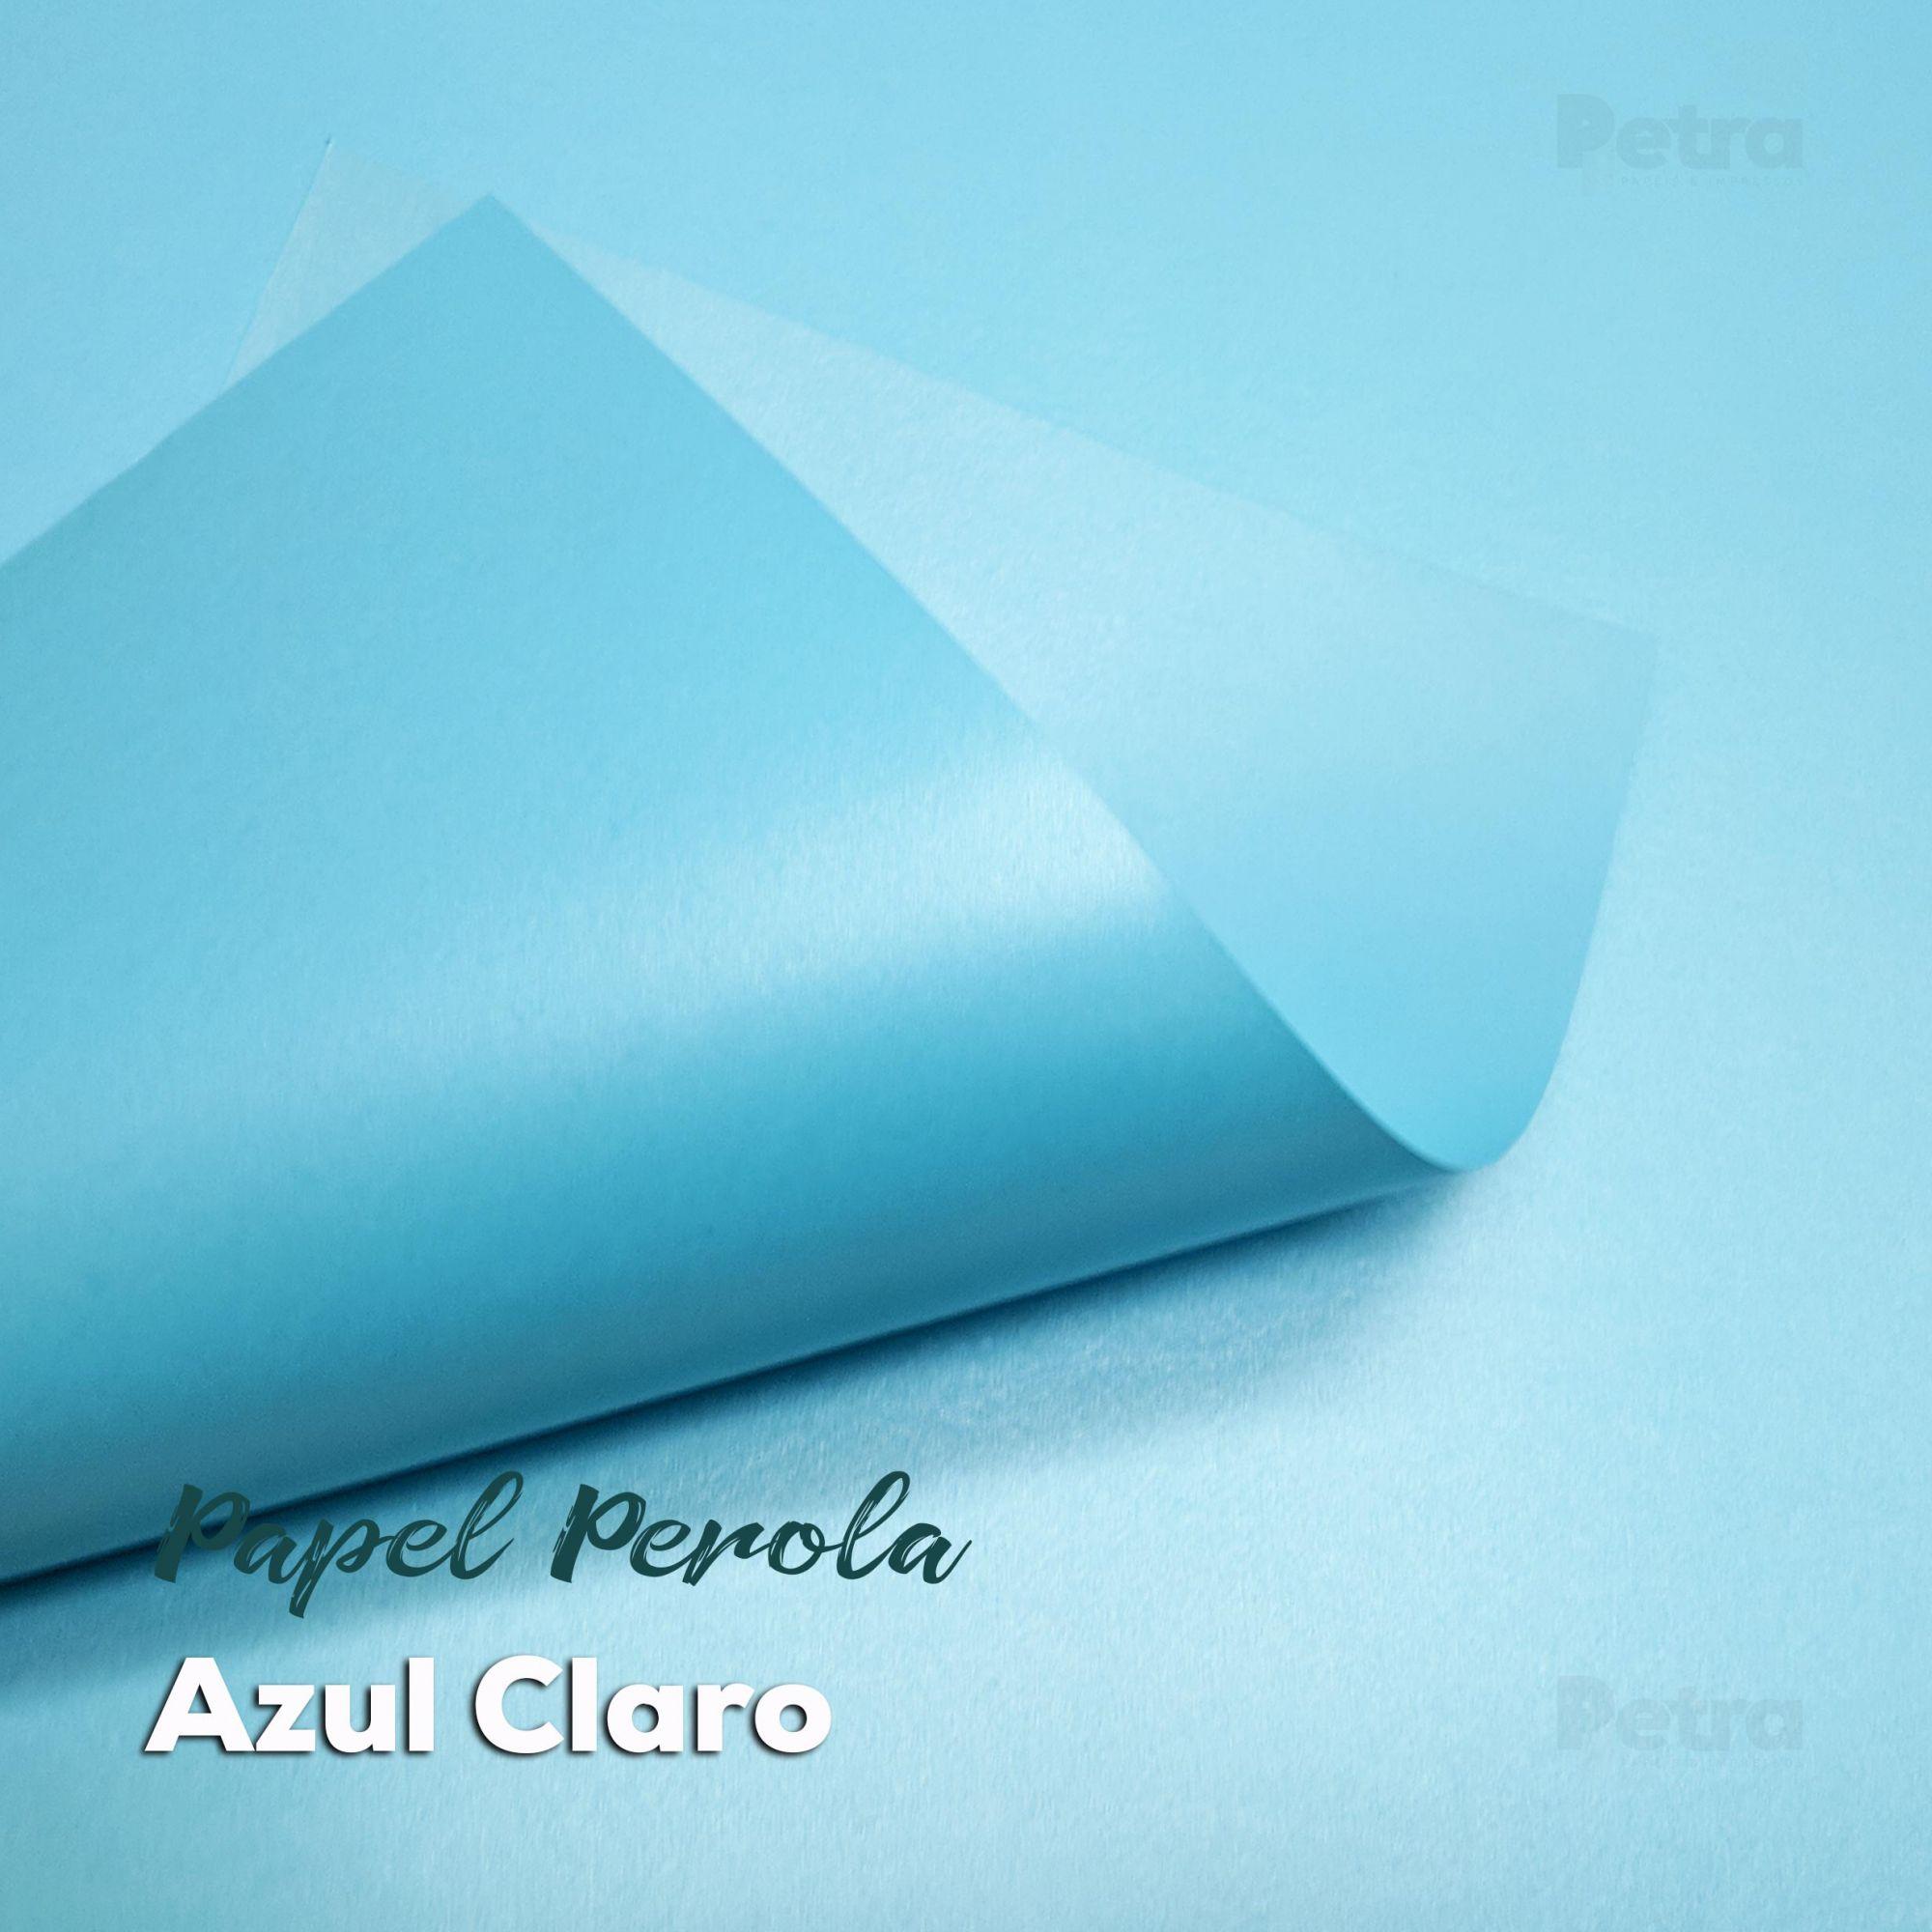 Papel Pérola Azul Claro Tam: 48x66cm 180g/m²